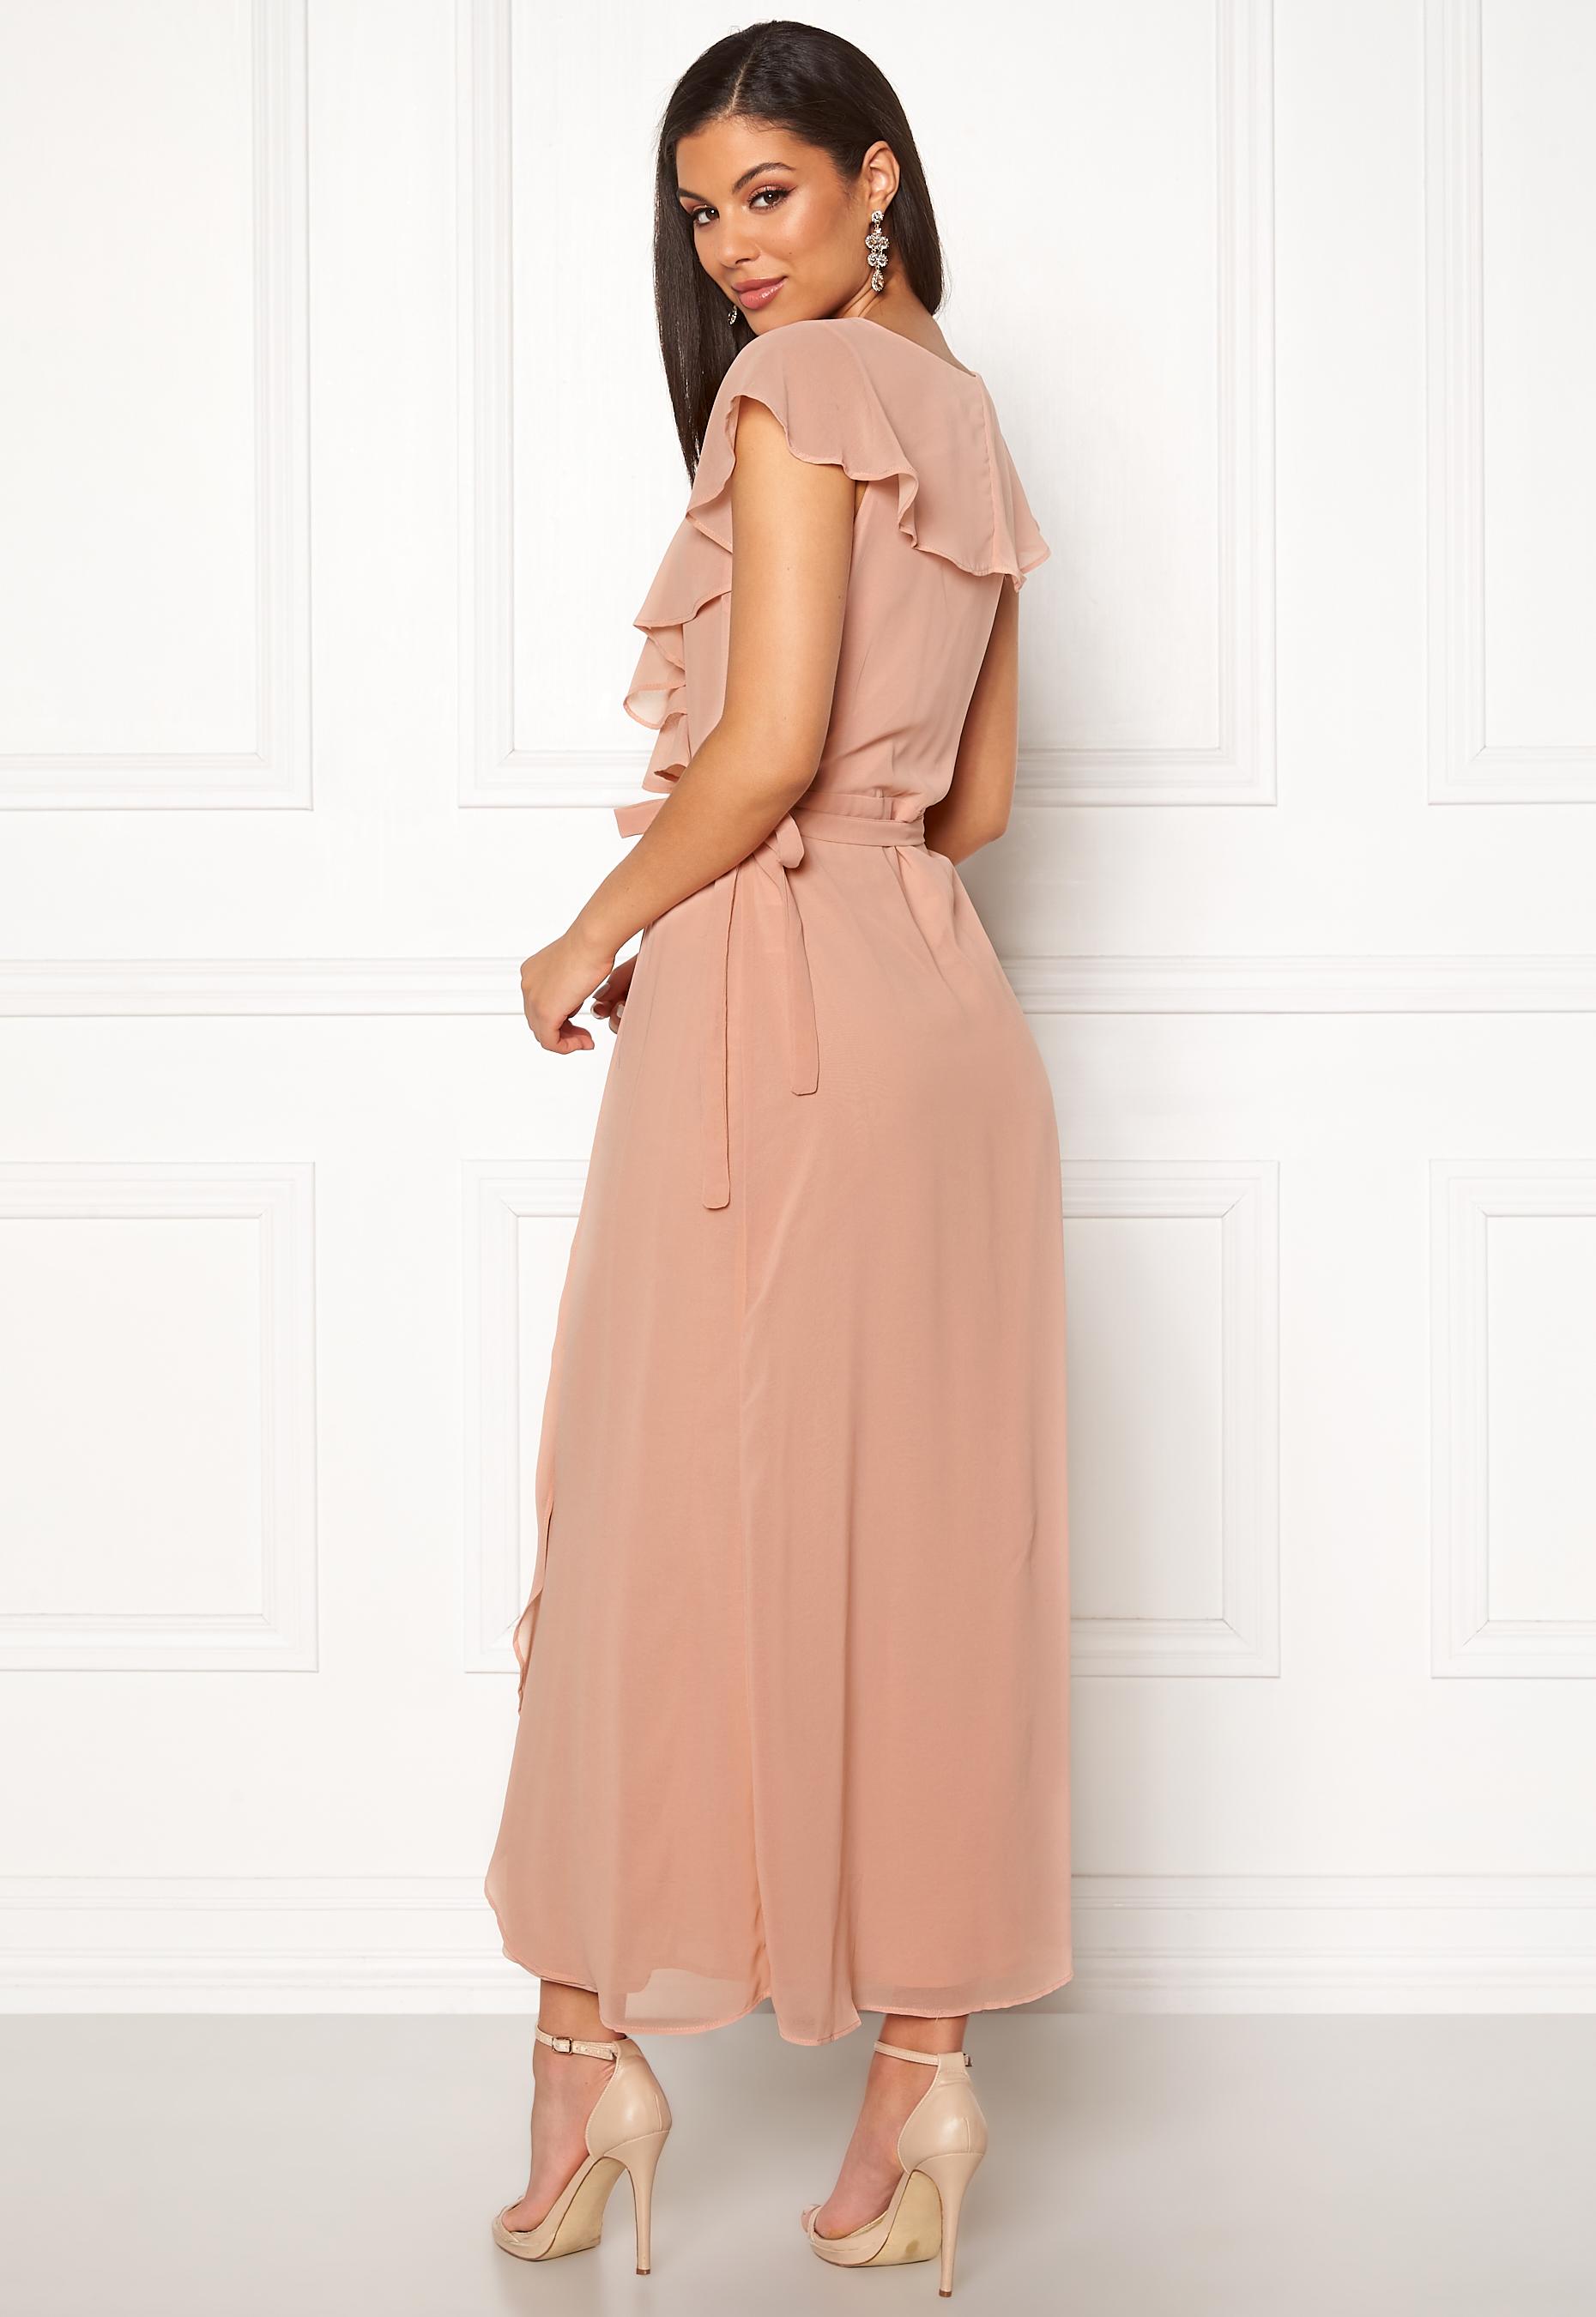 cf1c576a VERO MODA Vida SL Ankle Dress Misty Rose - Bubbleroom